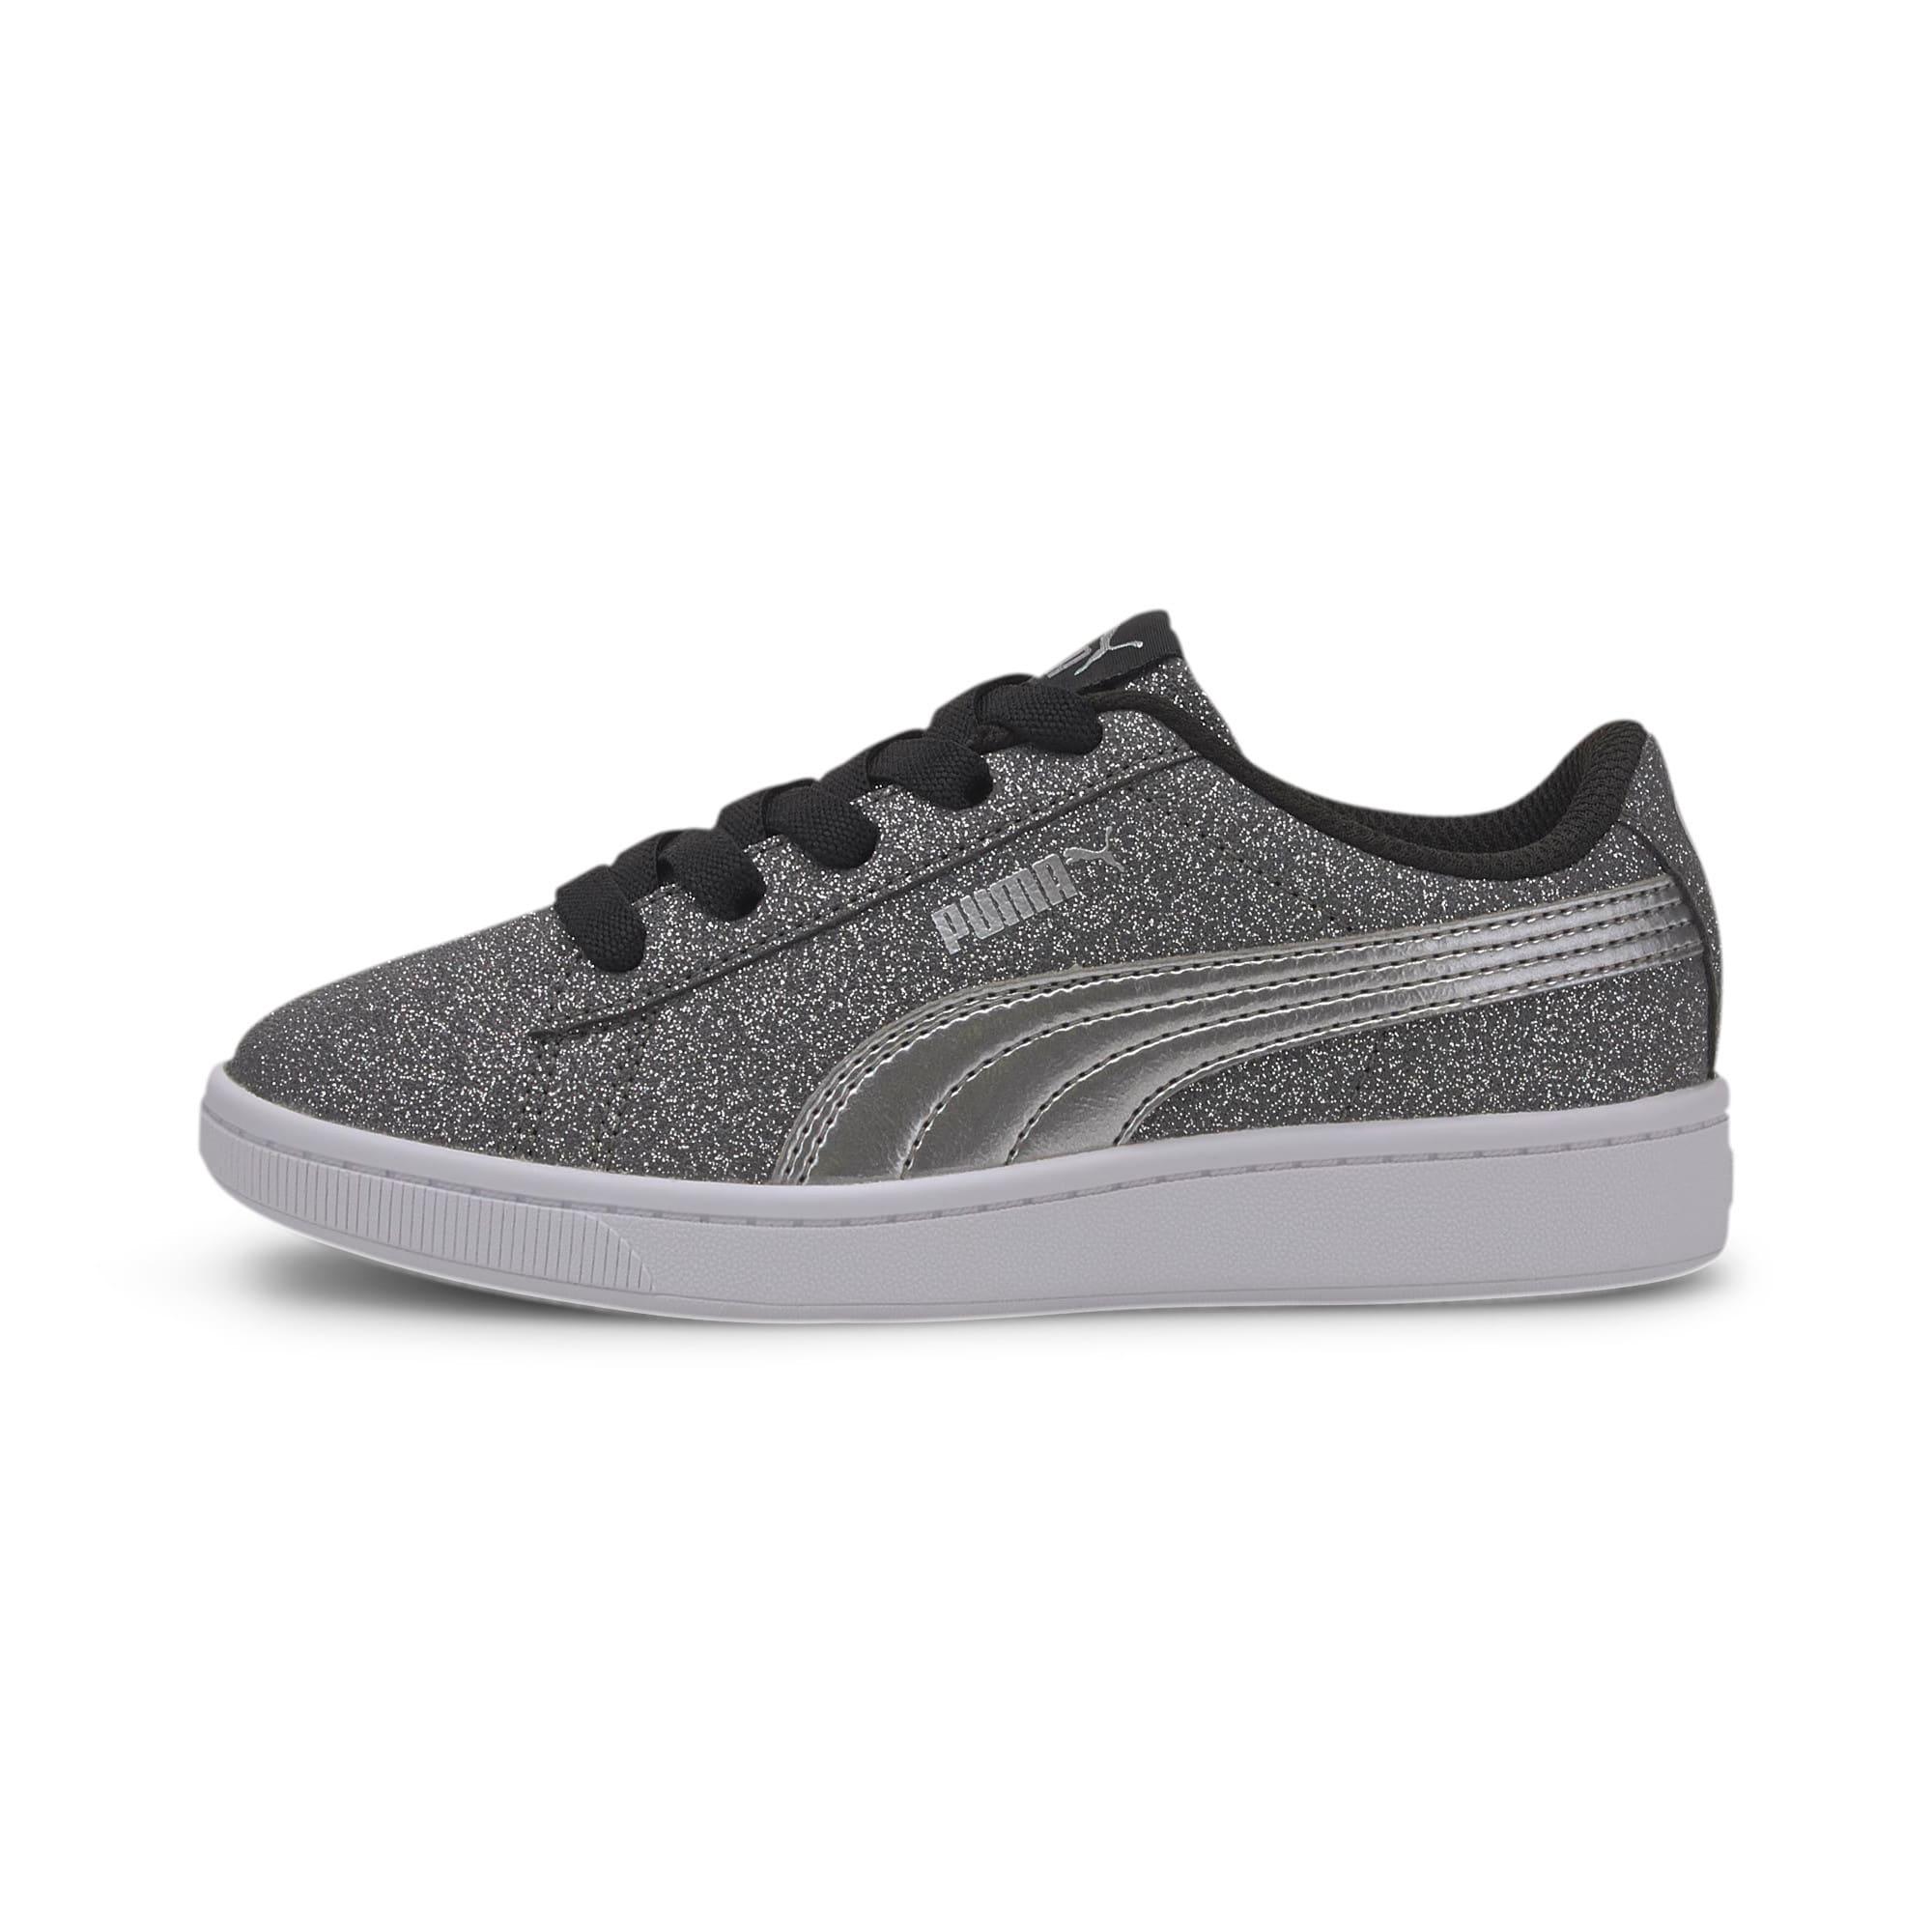 Thumbnail 1 of PUMA Vikky v2 Glitz AC Sneakers PS, Puma Black-Silver-White, medium